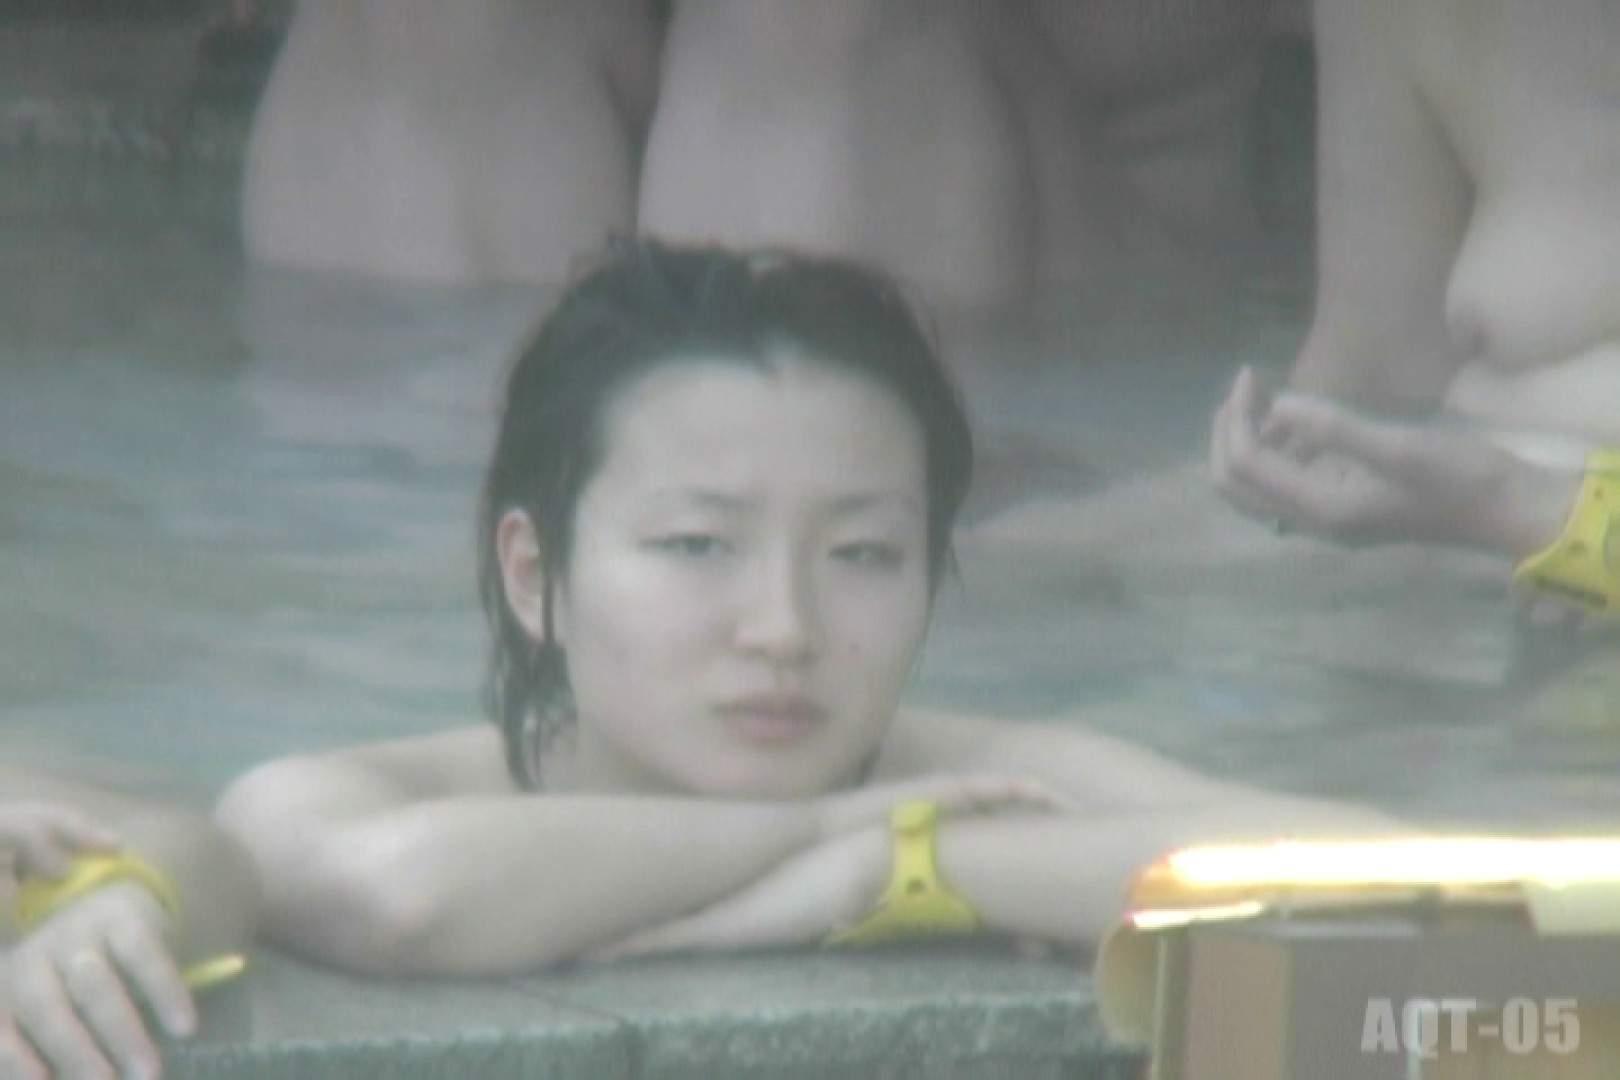 Aquaな露天風呂Vol.746 露天 オメコ動画キャプチャ 13pic 11